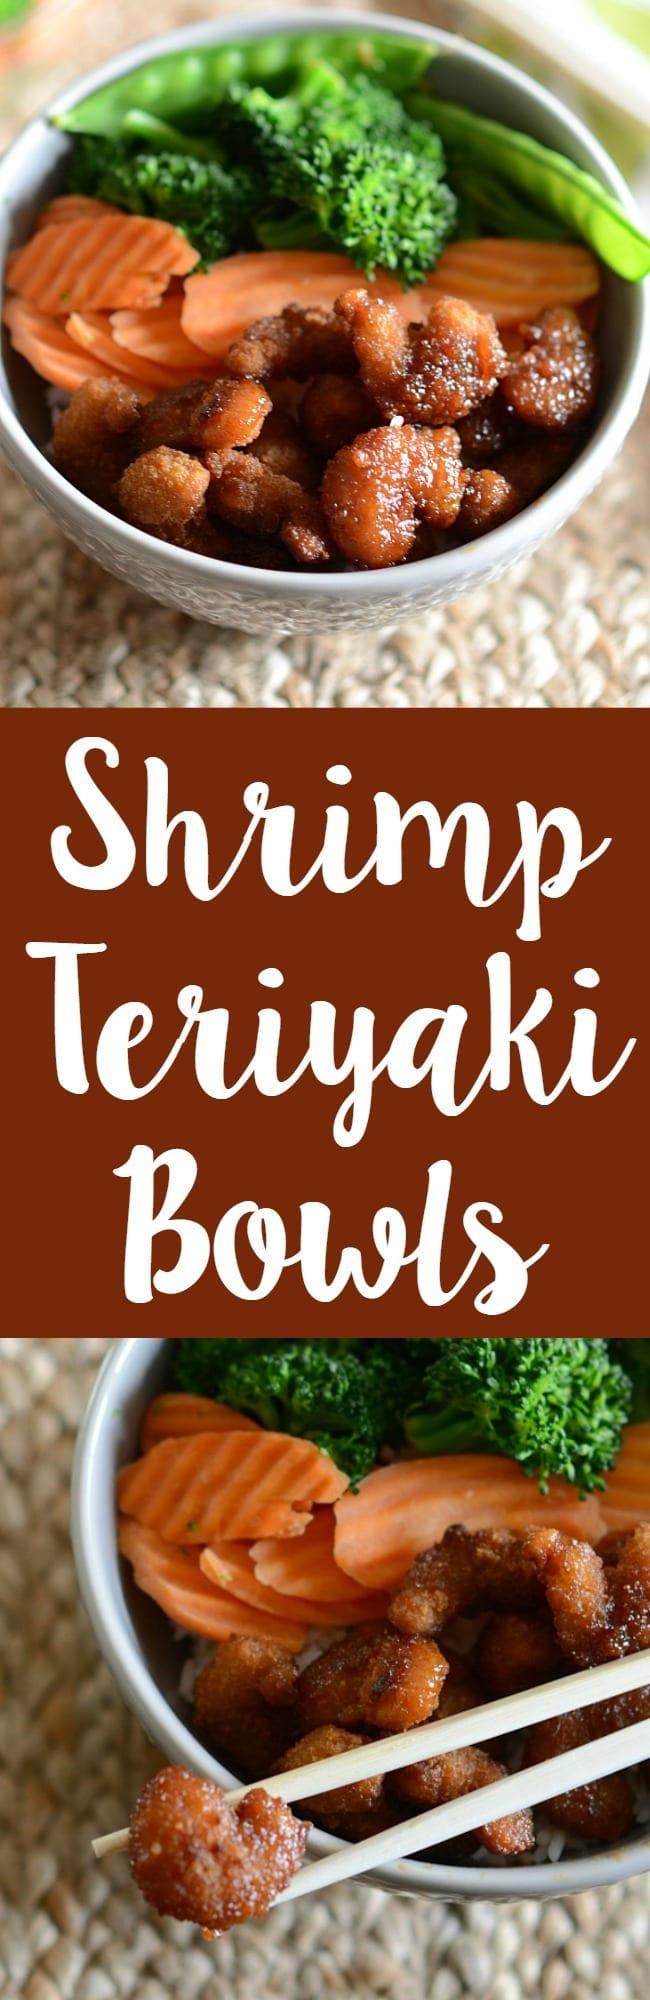 Easy and delicious shrimp teriyaki bowls! Rice on the bottom and then steamed veggies and shrimp with homemade teriyaki sauce!